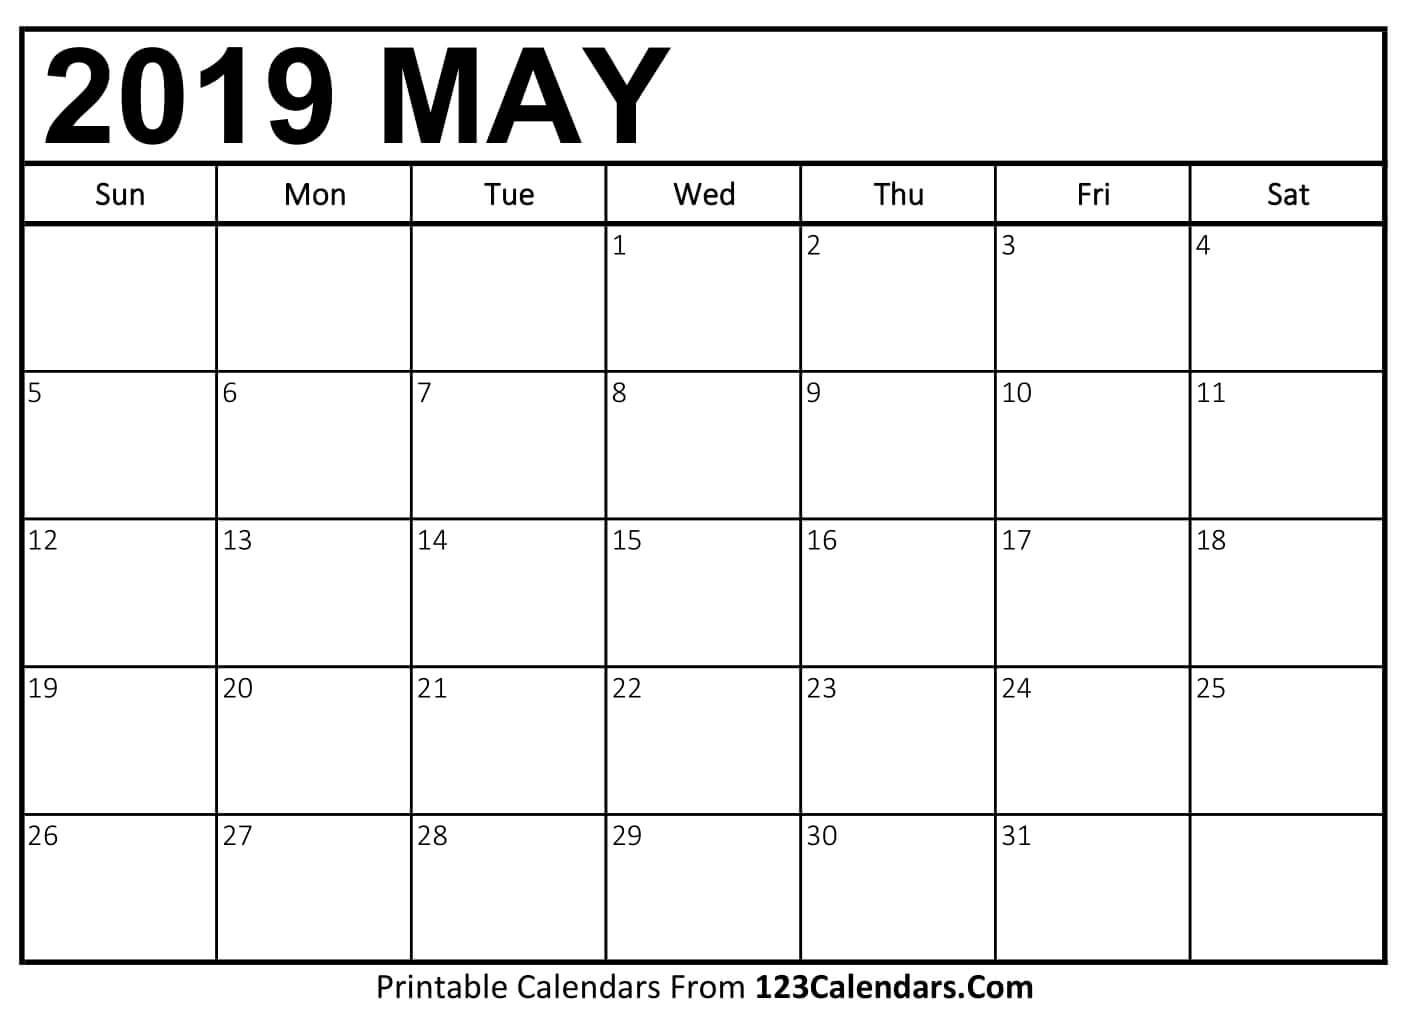 Printable May 2019 Calendar Templates - 123Calendars Calendar 2019 May